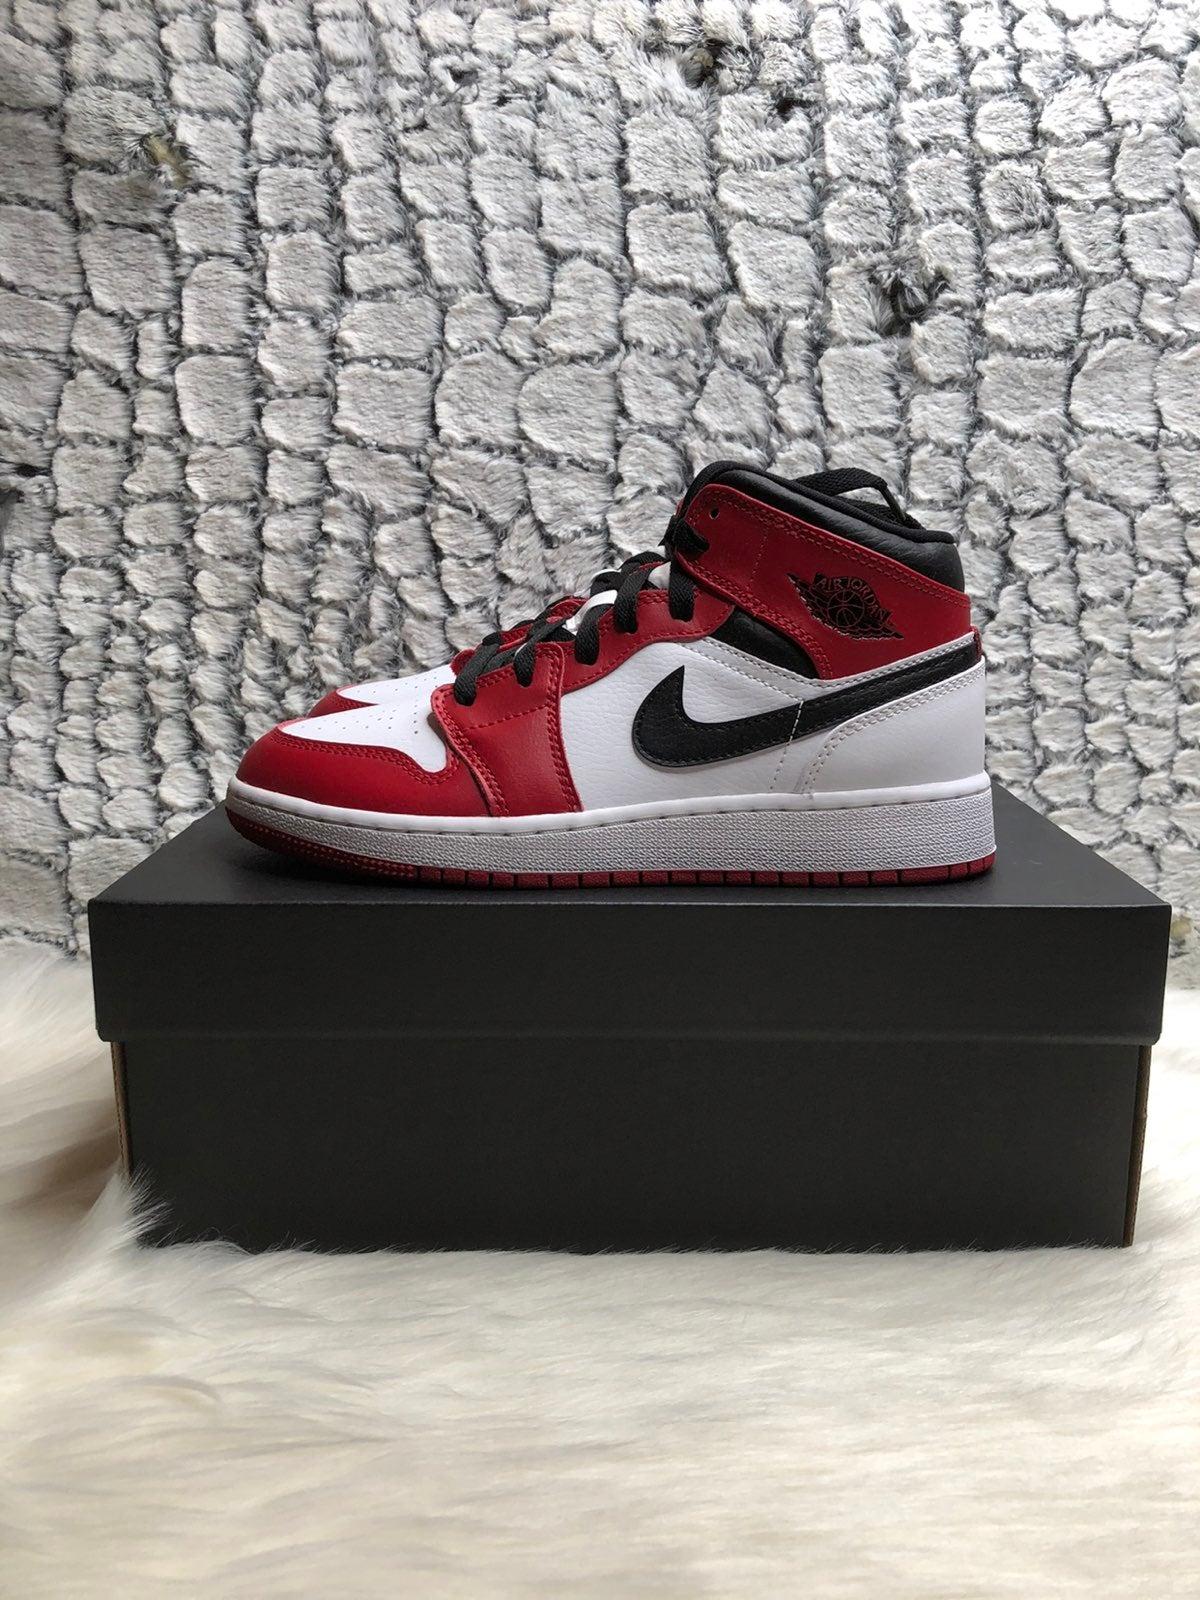 Jordan 1 white heels